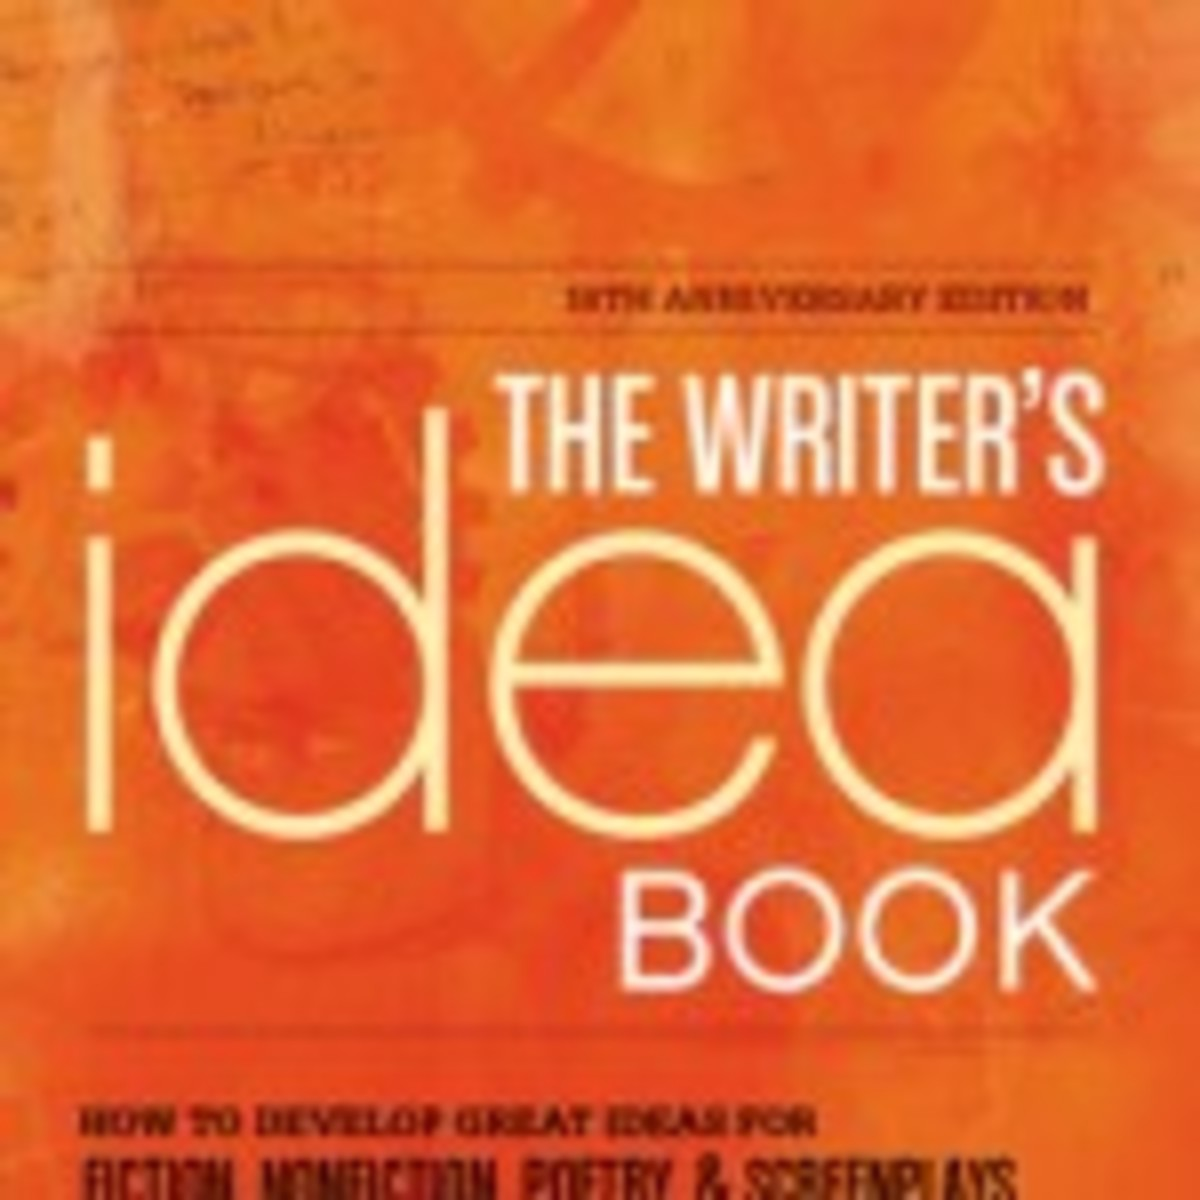 W3606 WritersIdeaBook